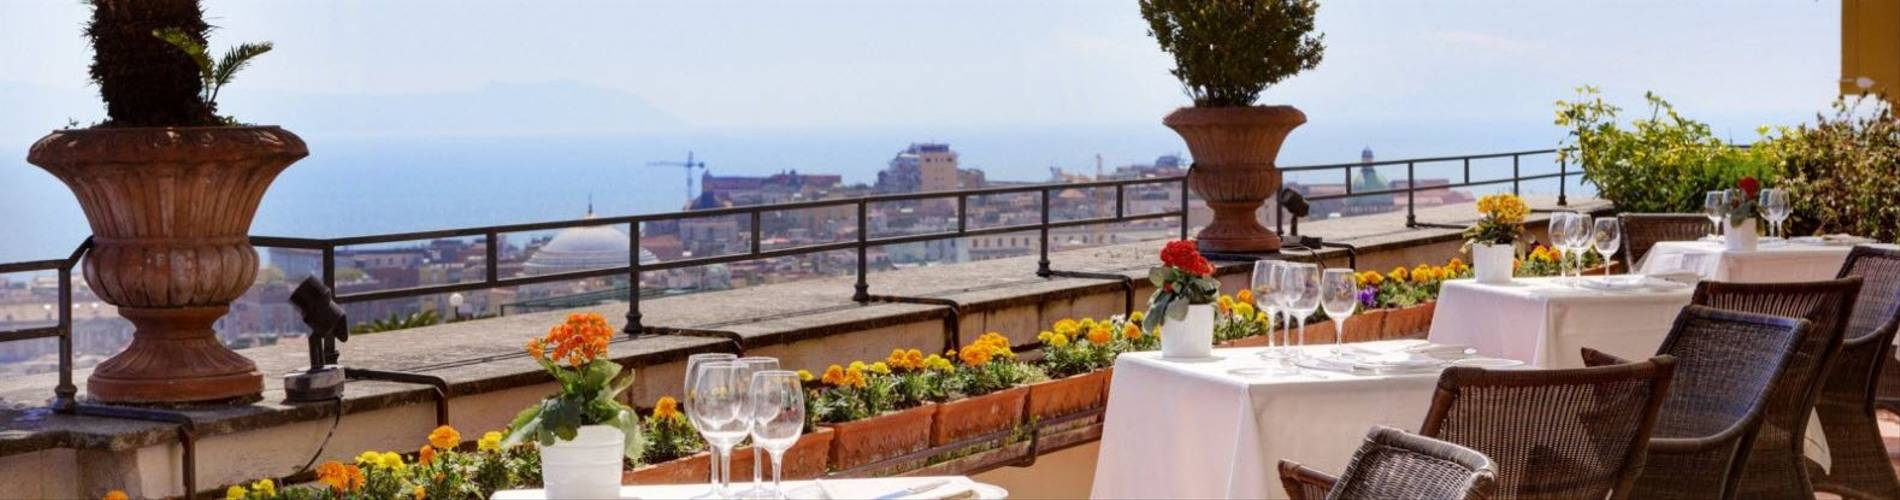 San Francesco Al Monte, Naples, Italy (13).jpg